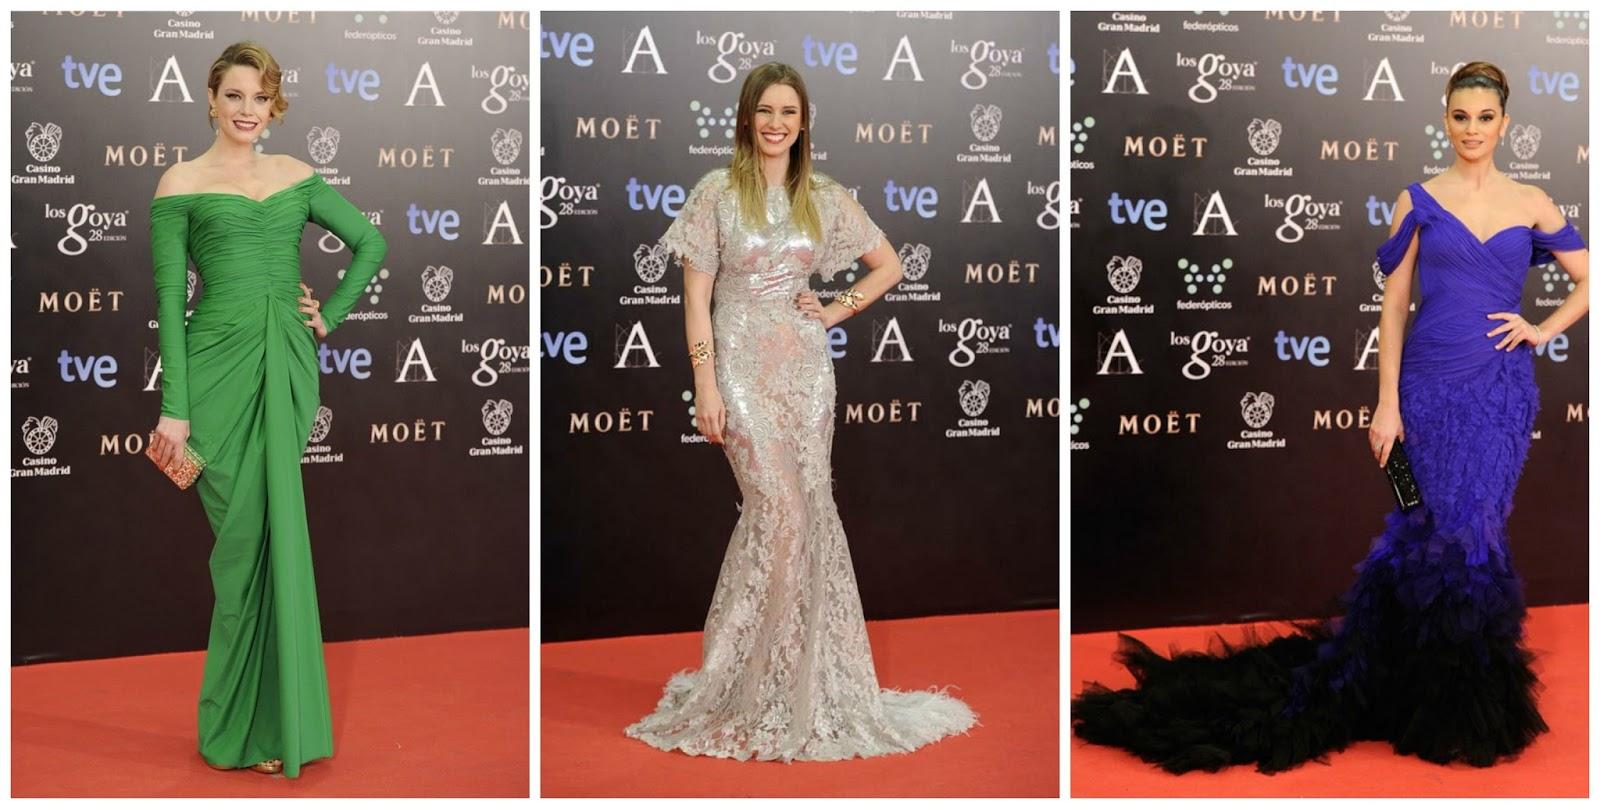 Carolina Bang-Manuela-Vellés-Norma Ruiz Peor vestidas goya 2014